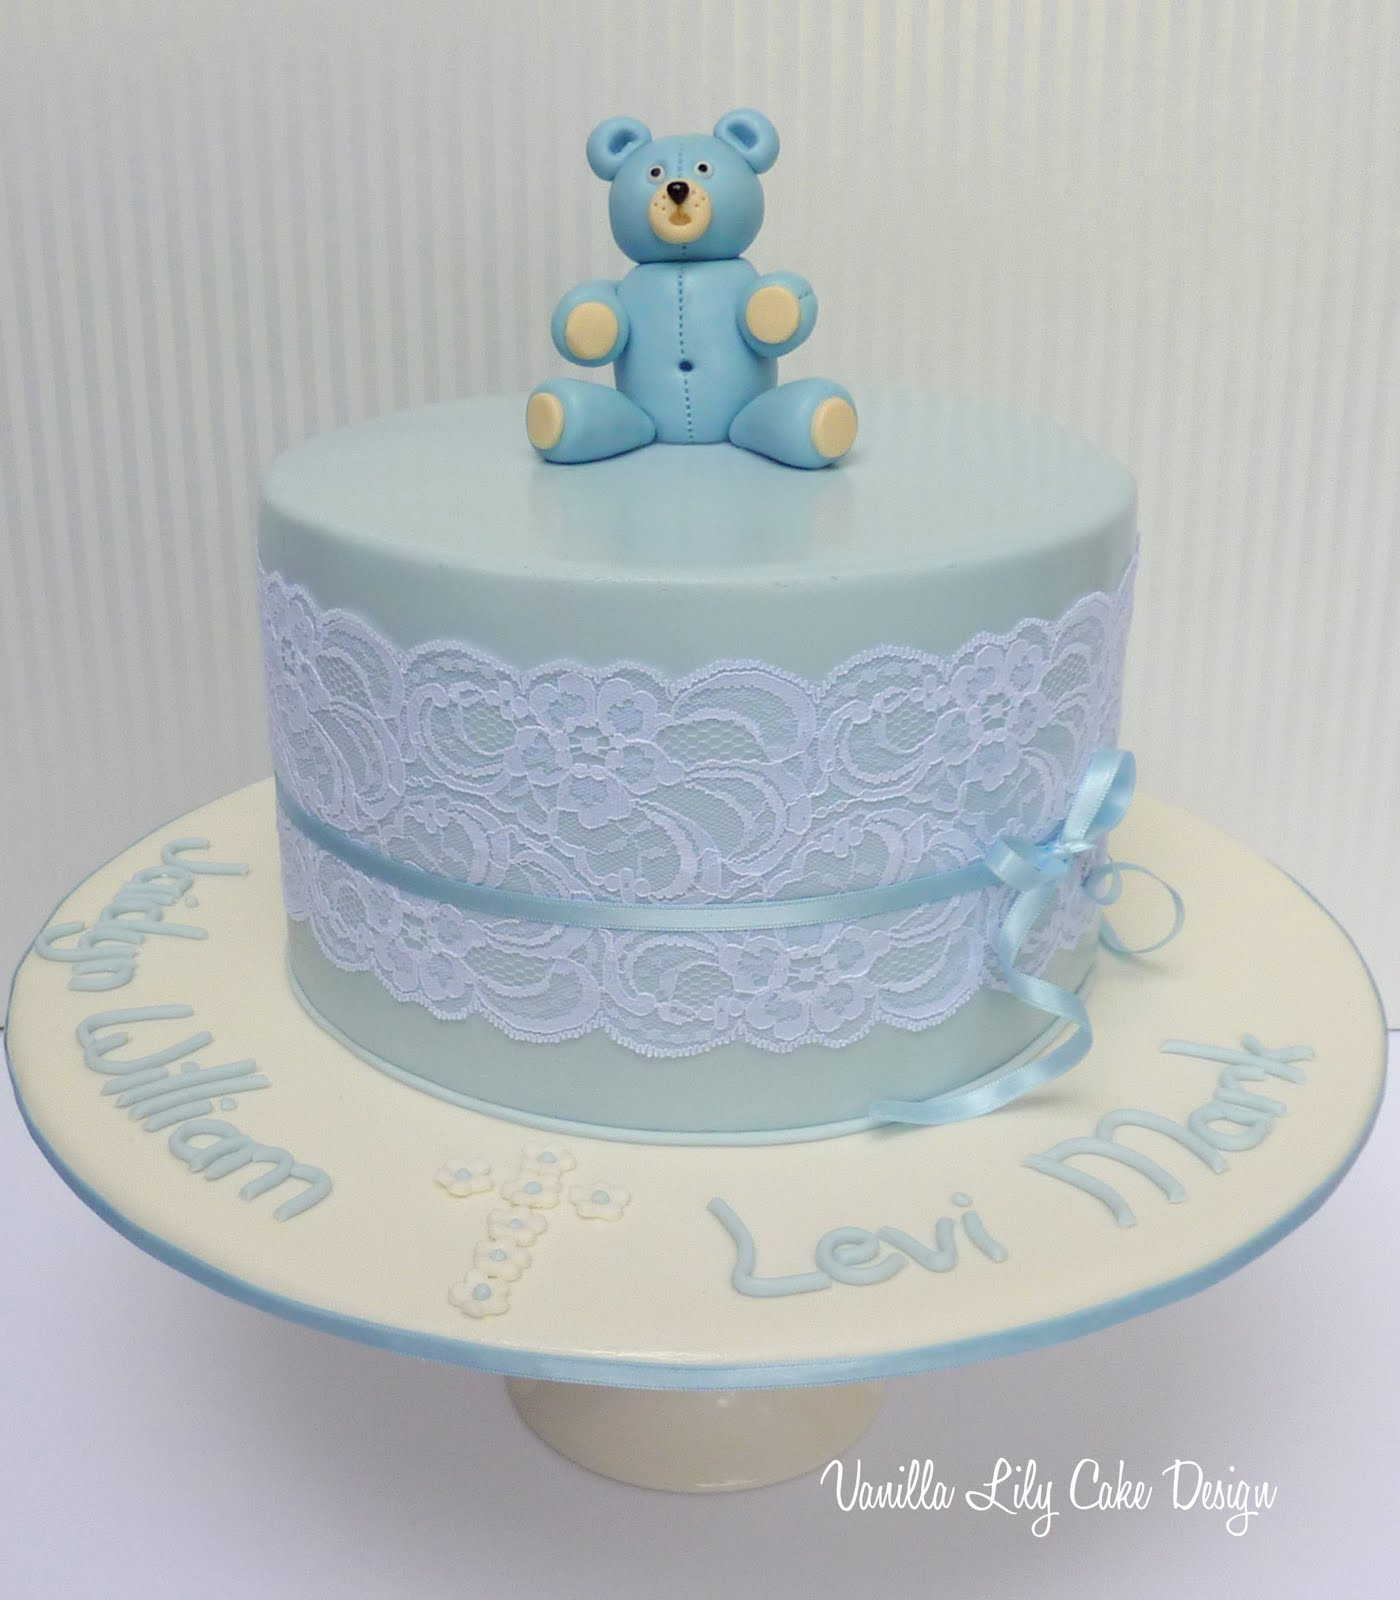 Christening Cake Design Boy : Vanilla Lily Cake Design: teddy bear christening cake.....